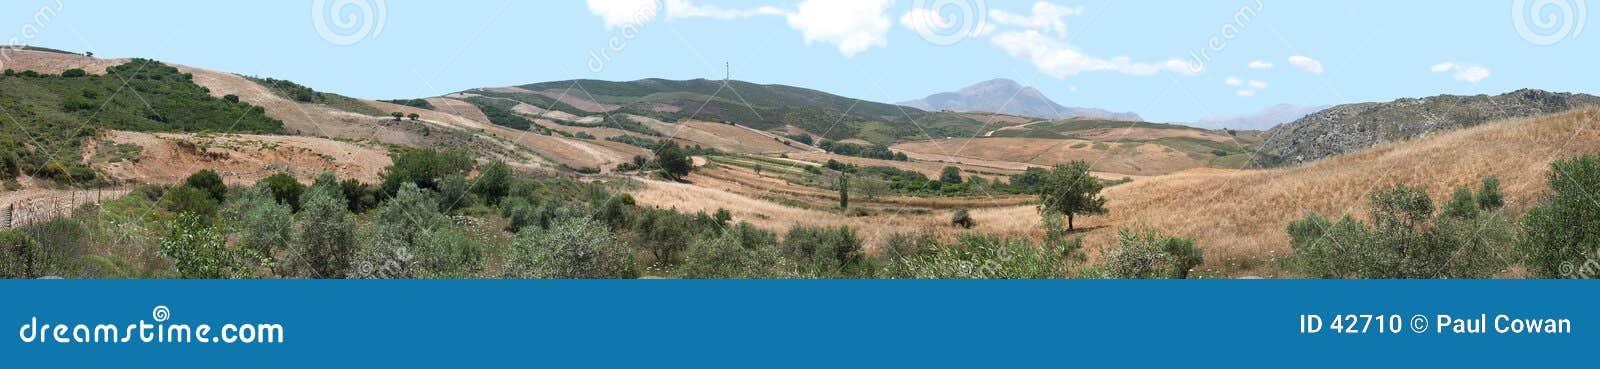 Cretanpanorama